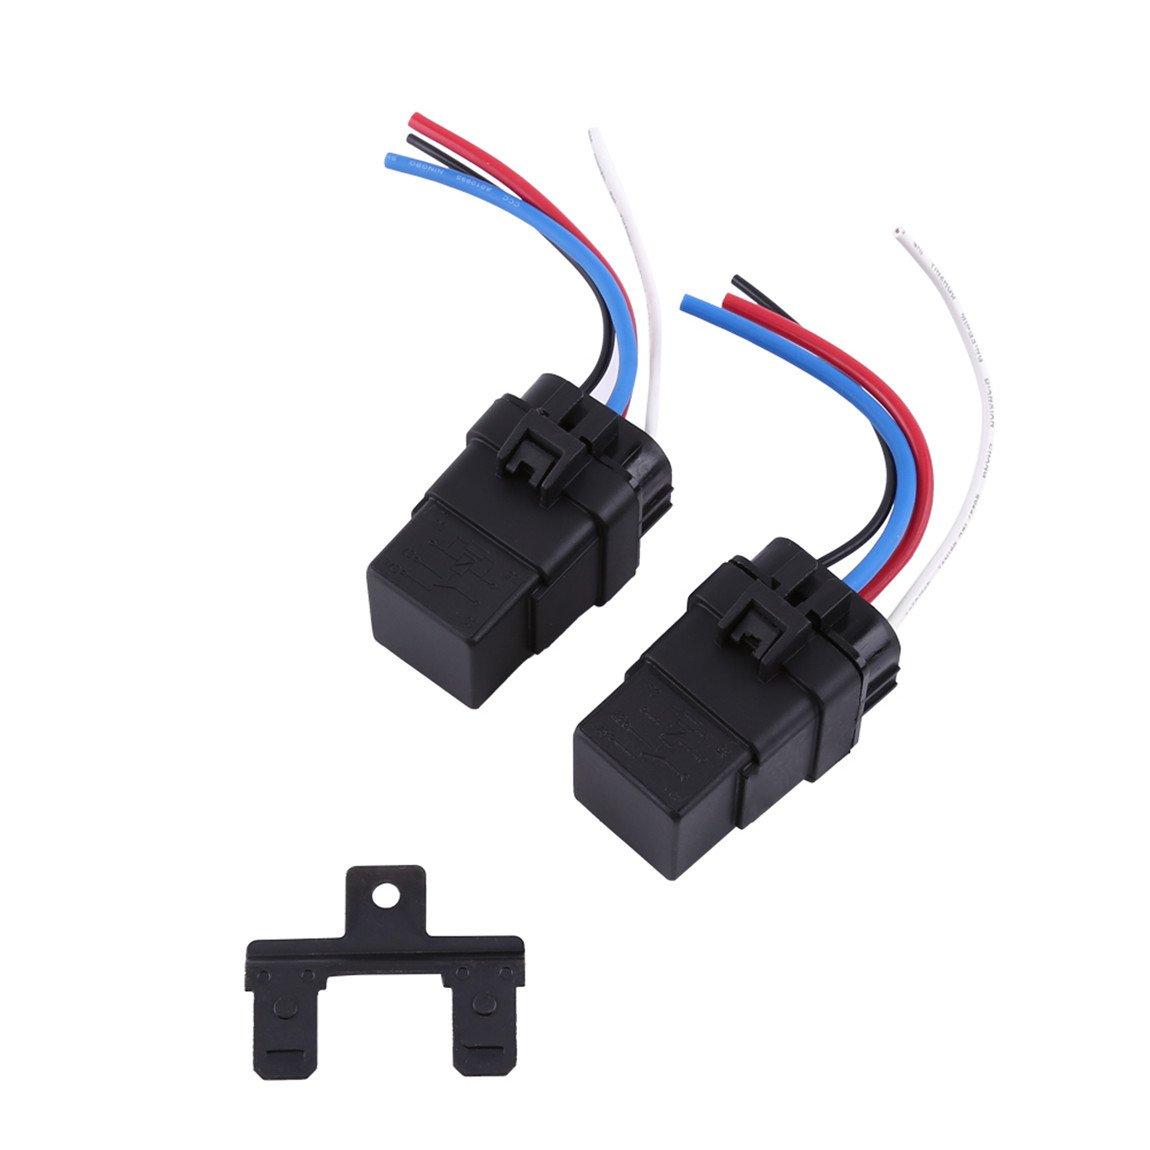 Car Truck Motor 12V 40A Relay Socket Plug 4Pin 4 Wire Waterproof Kit Pack of 2 Yosoo